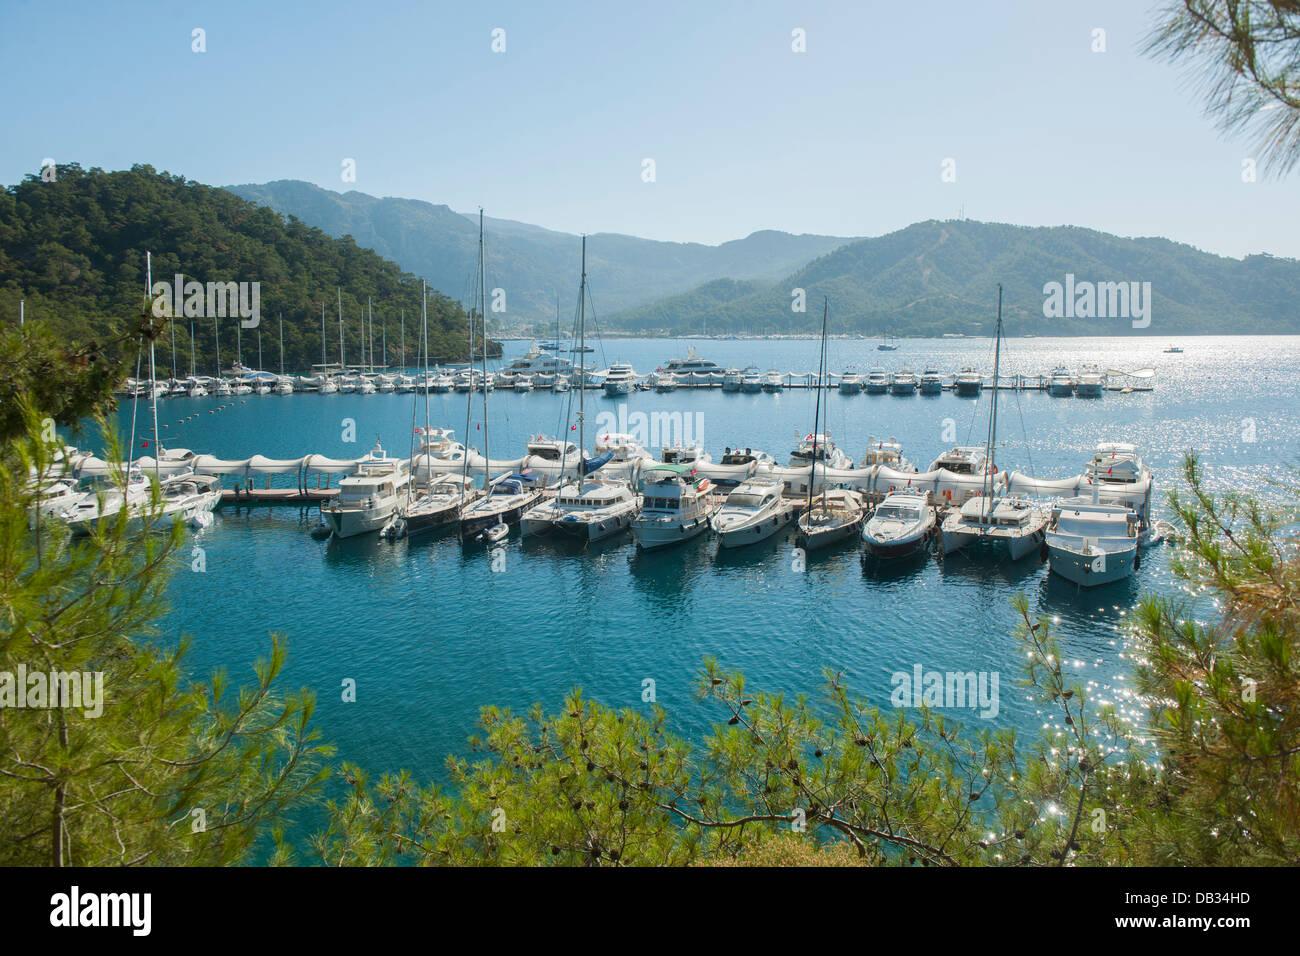 Türkei, Provinz Mugla, Fethiye, Bootsstege der Marin Turk Photo Stock